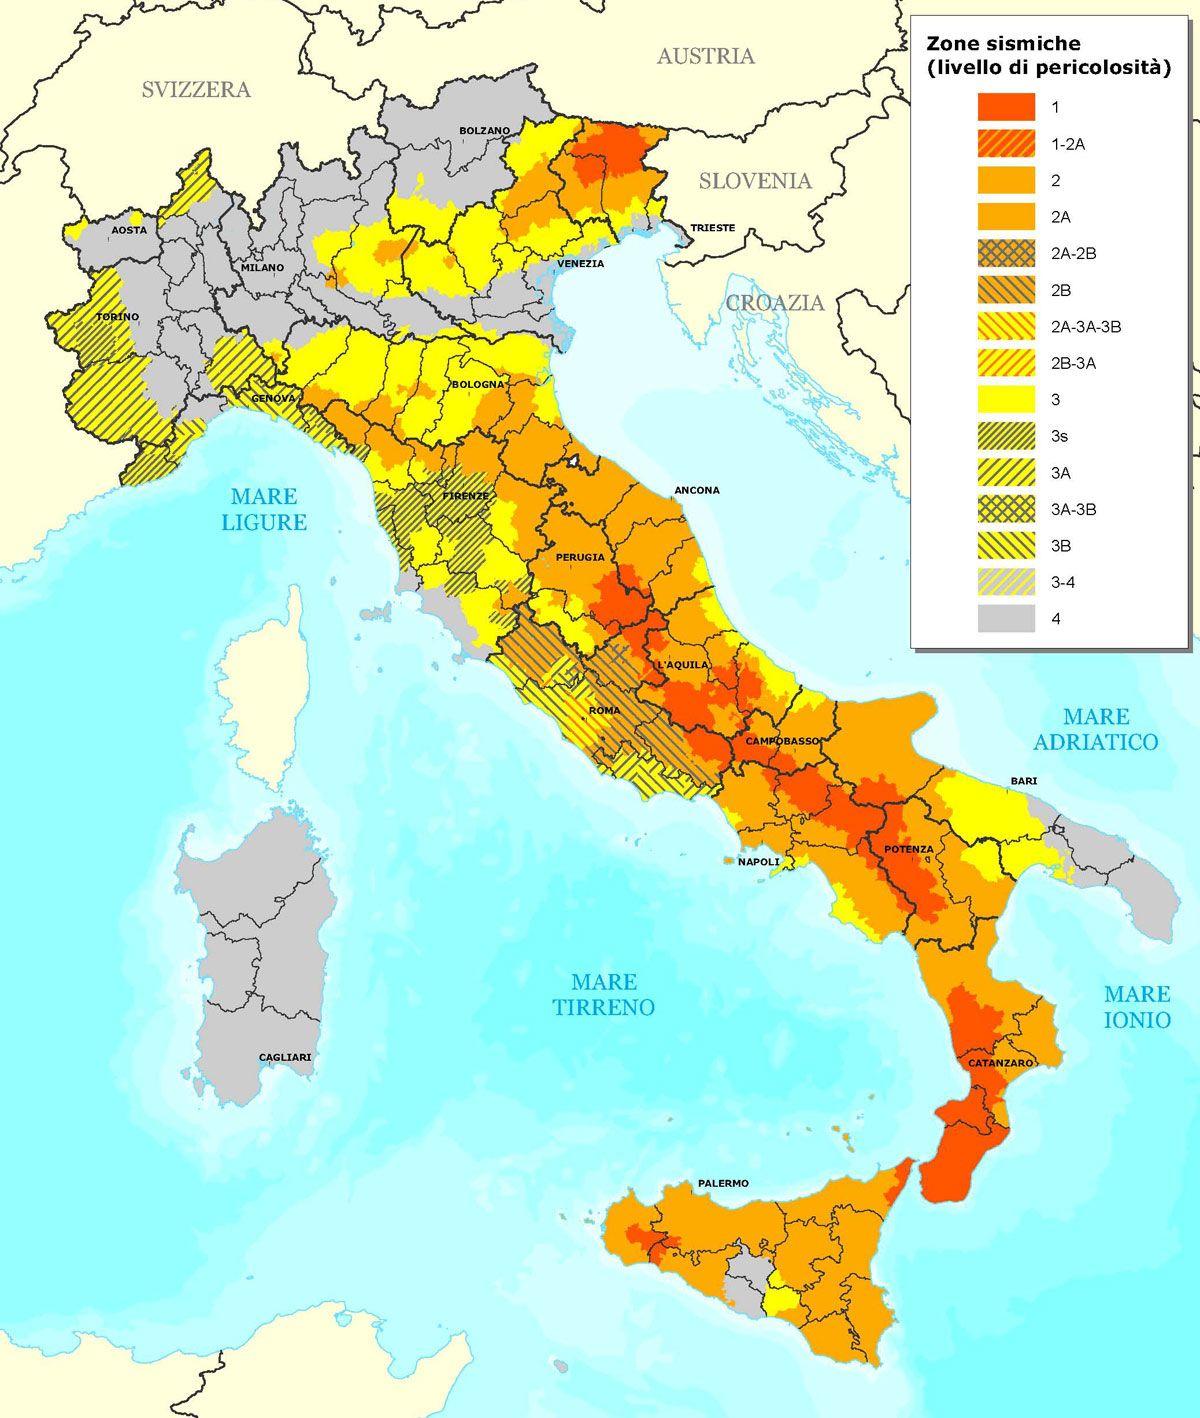 Italian earthquakes earthquakes in italy earth tremors italy